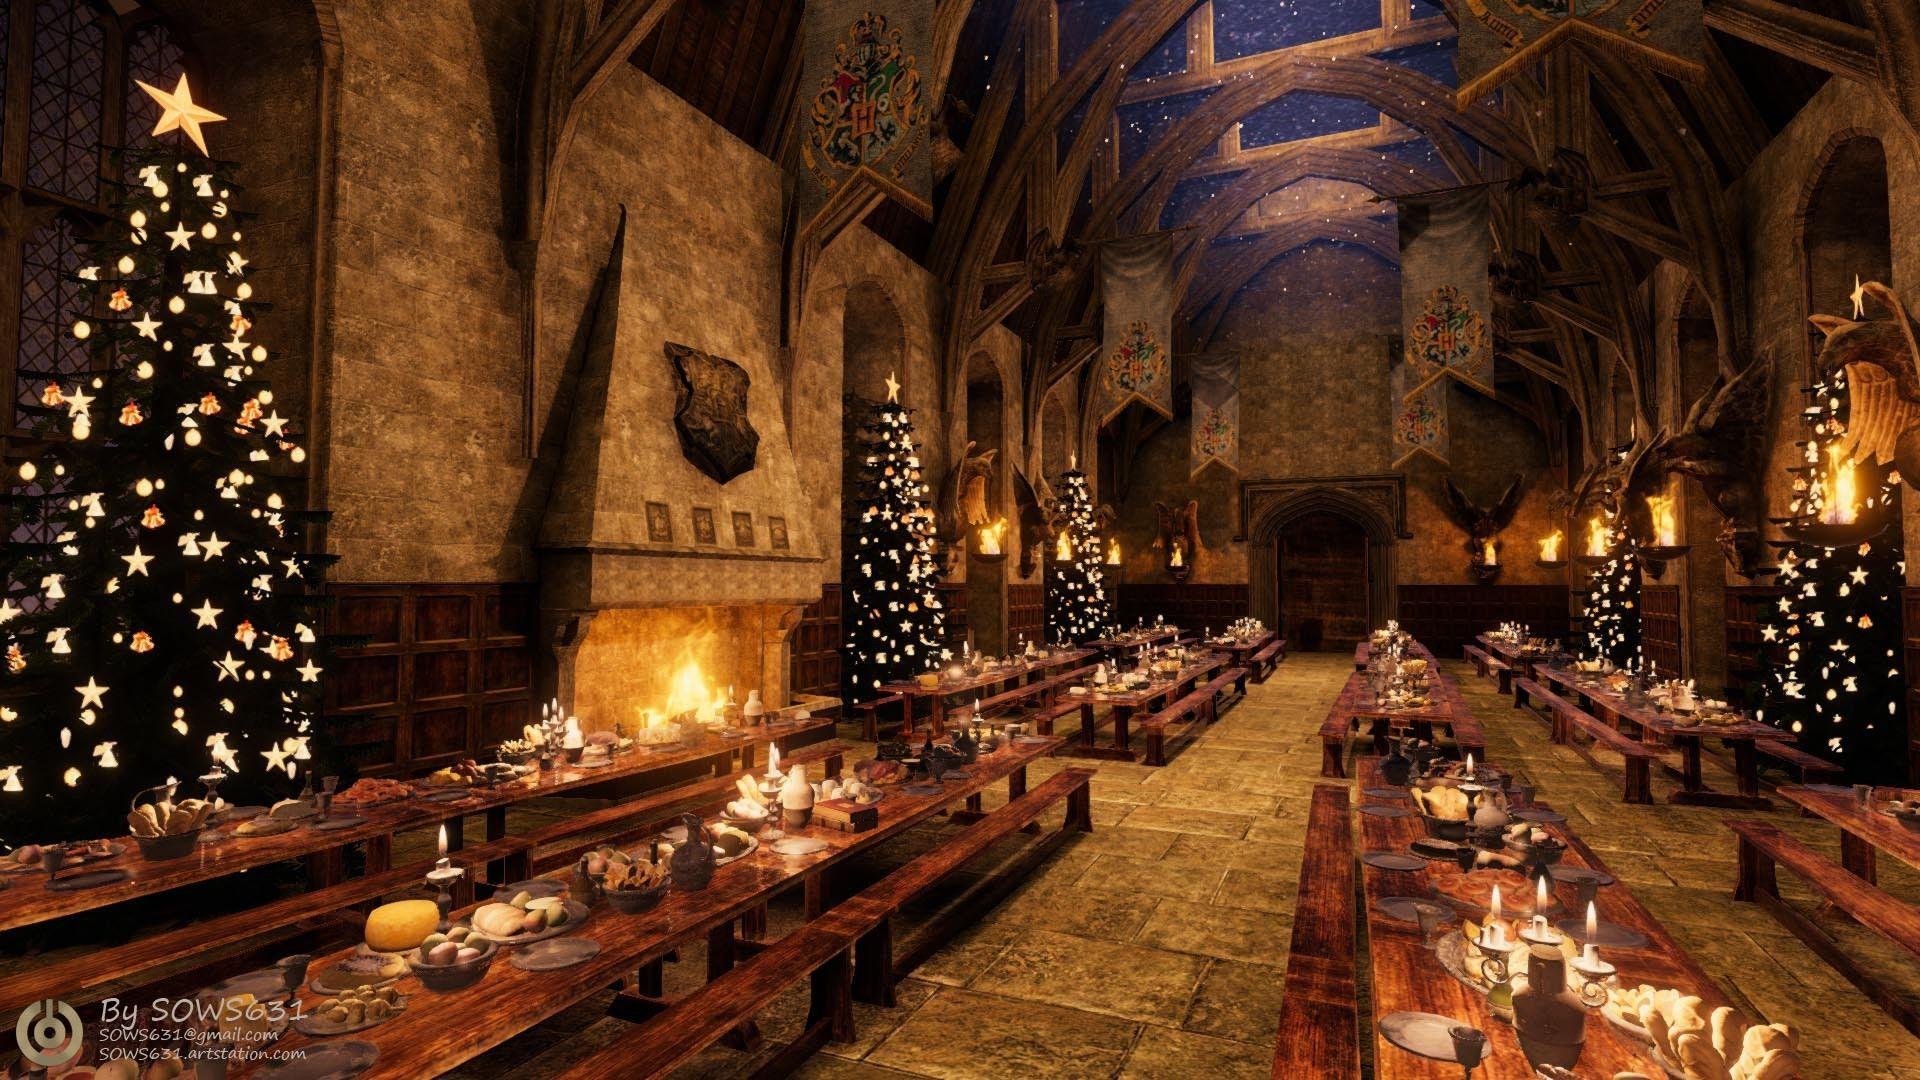 Hogwarts Christmas Wallpapers Top Free Hogwarts Christmas